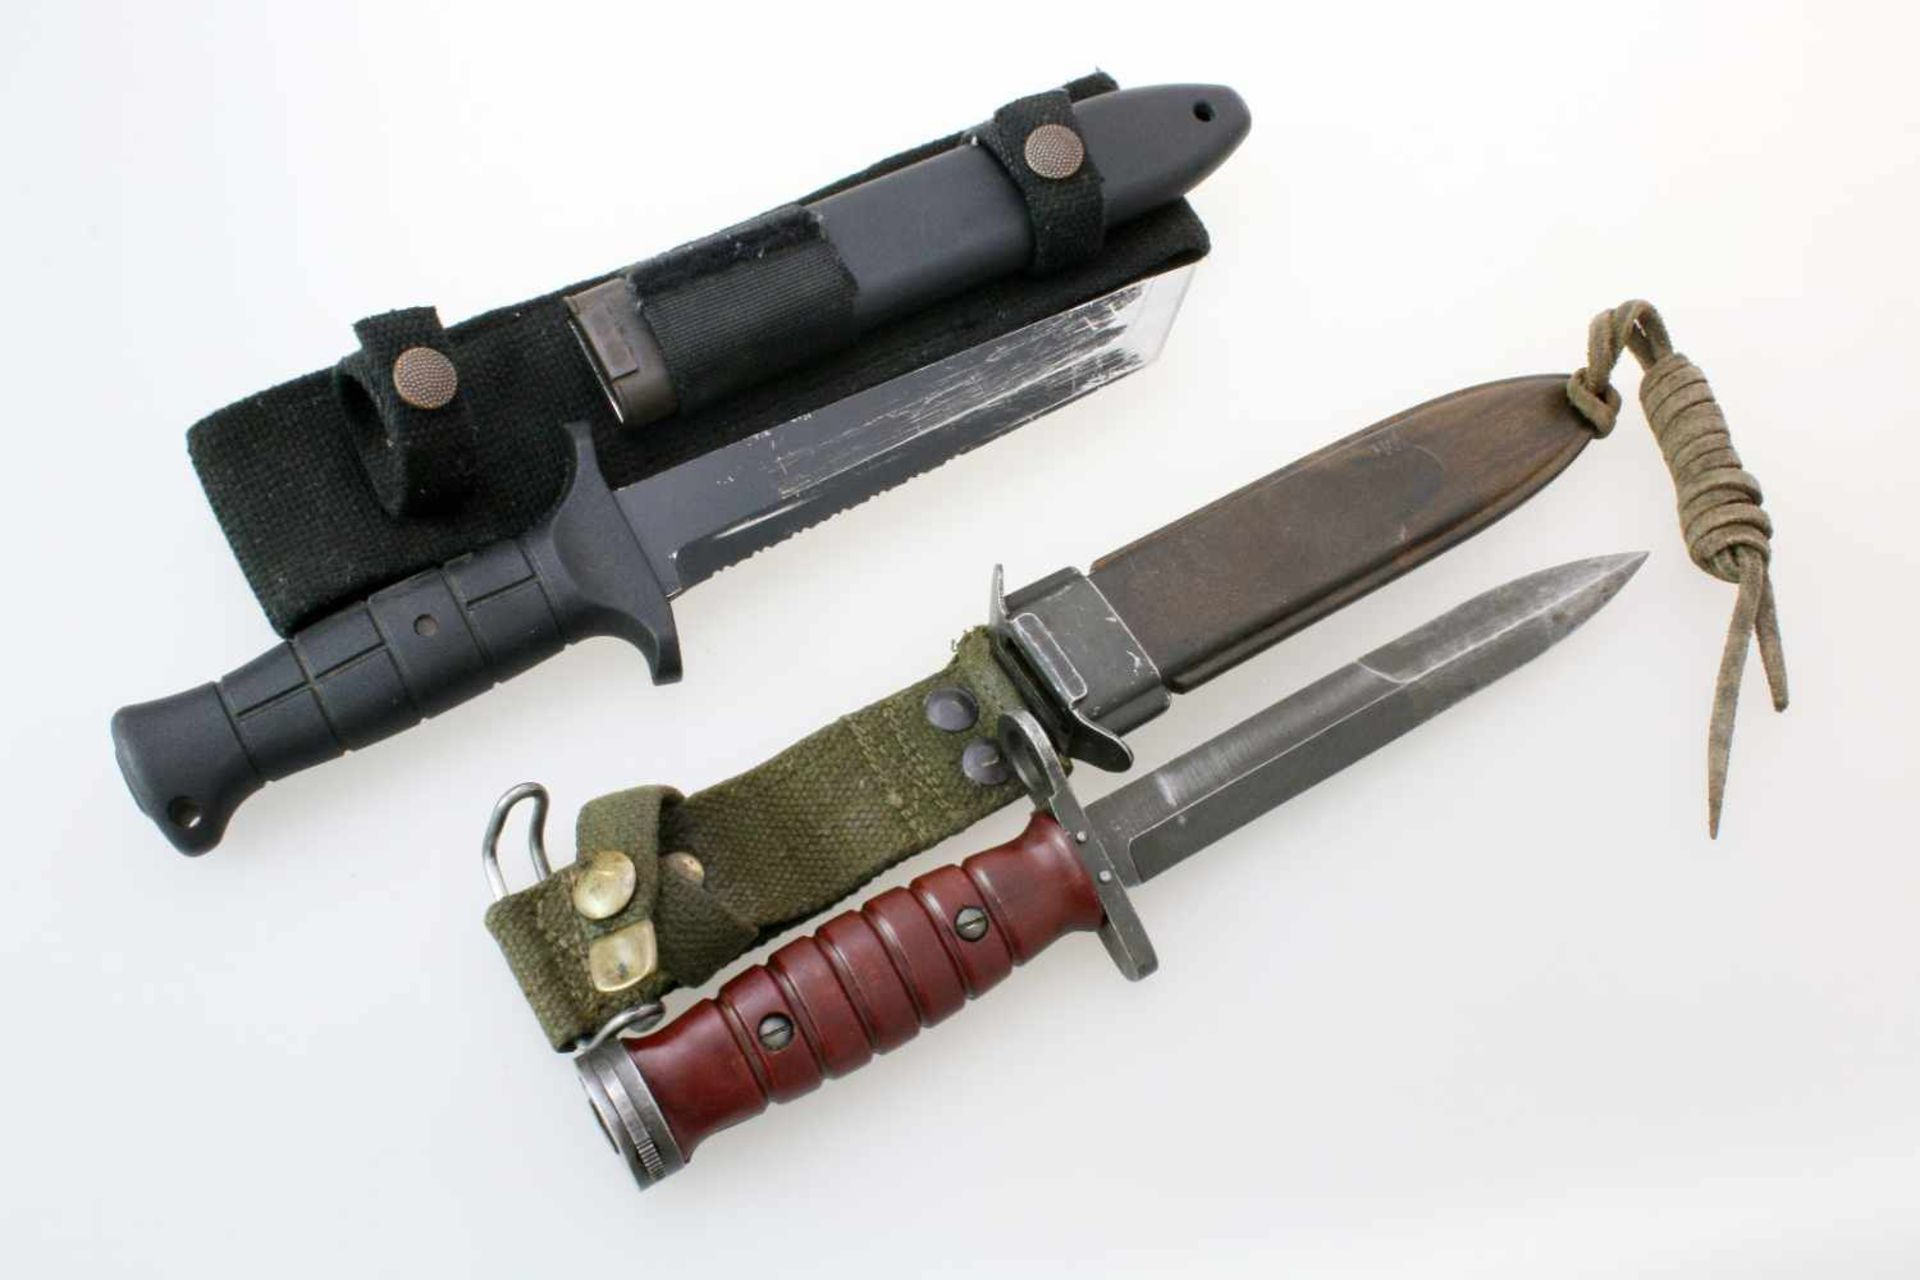 BW Mehrzweckmesser KM2K & Messerbajonett n. Muster M4 zum Carbine M11x BW Mehrzweckmesser KM2K.